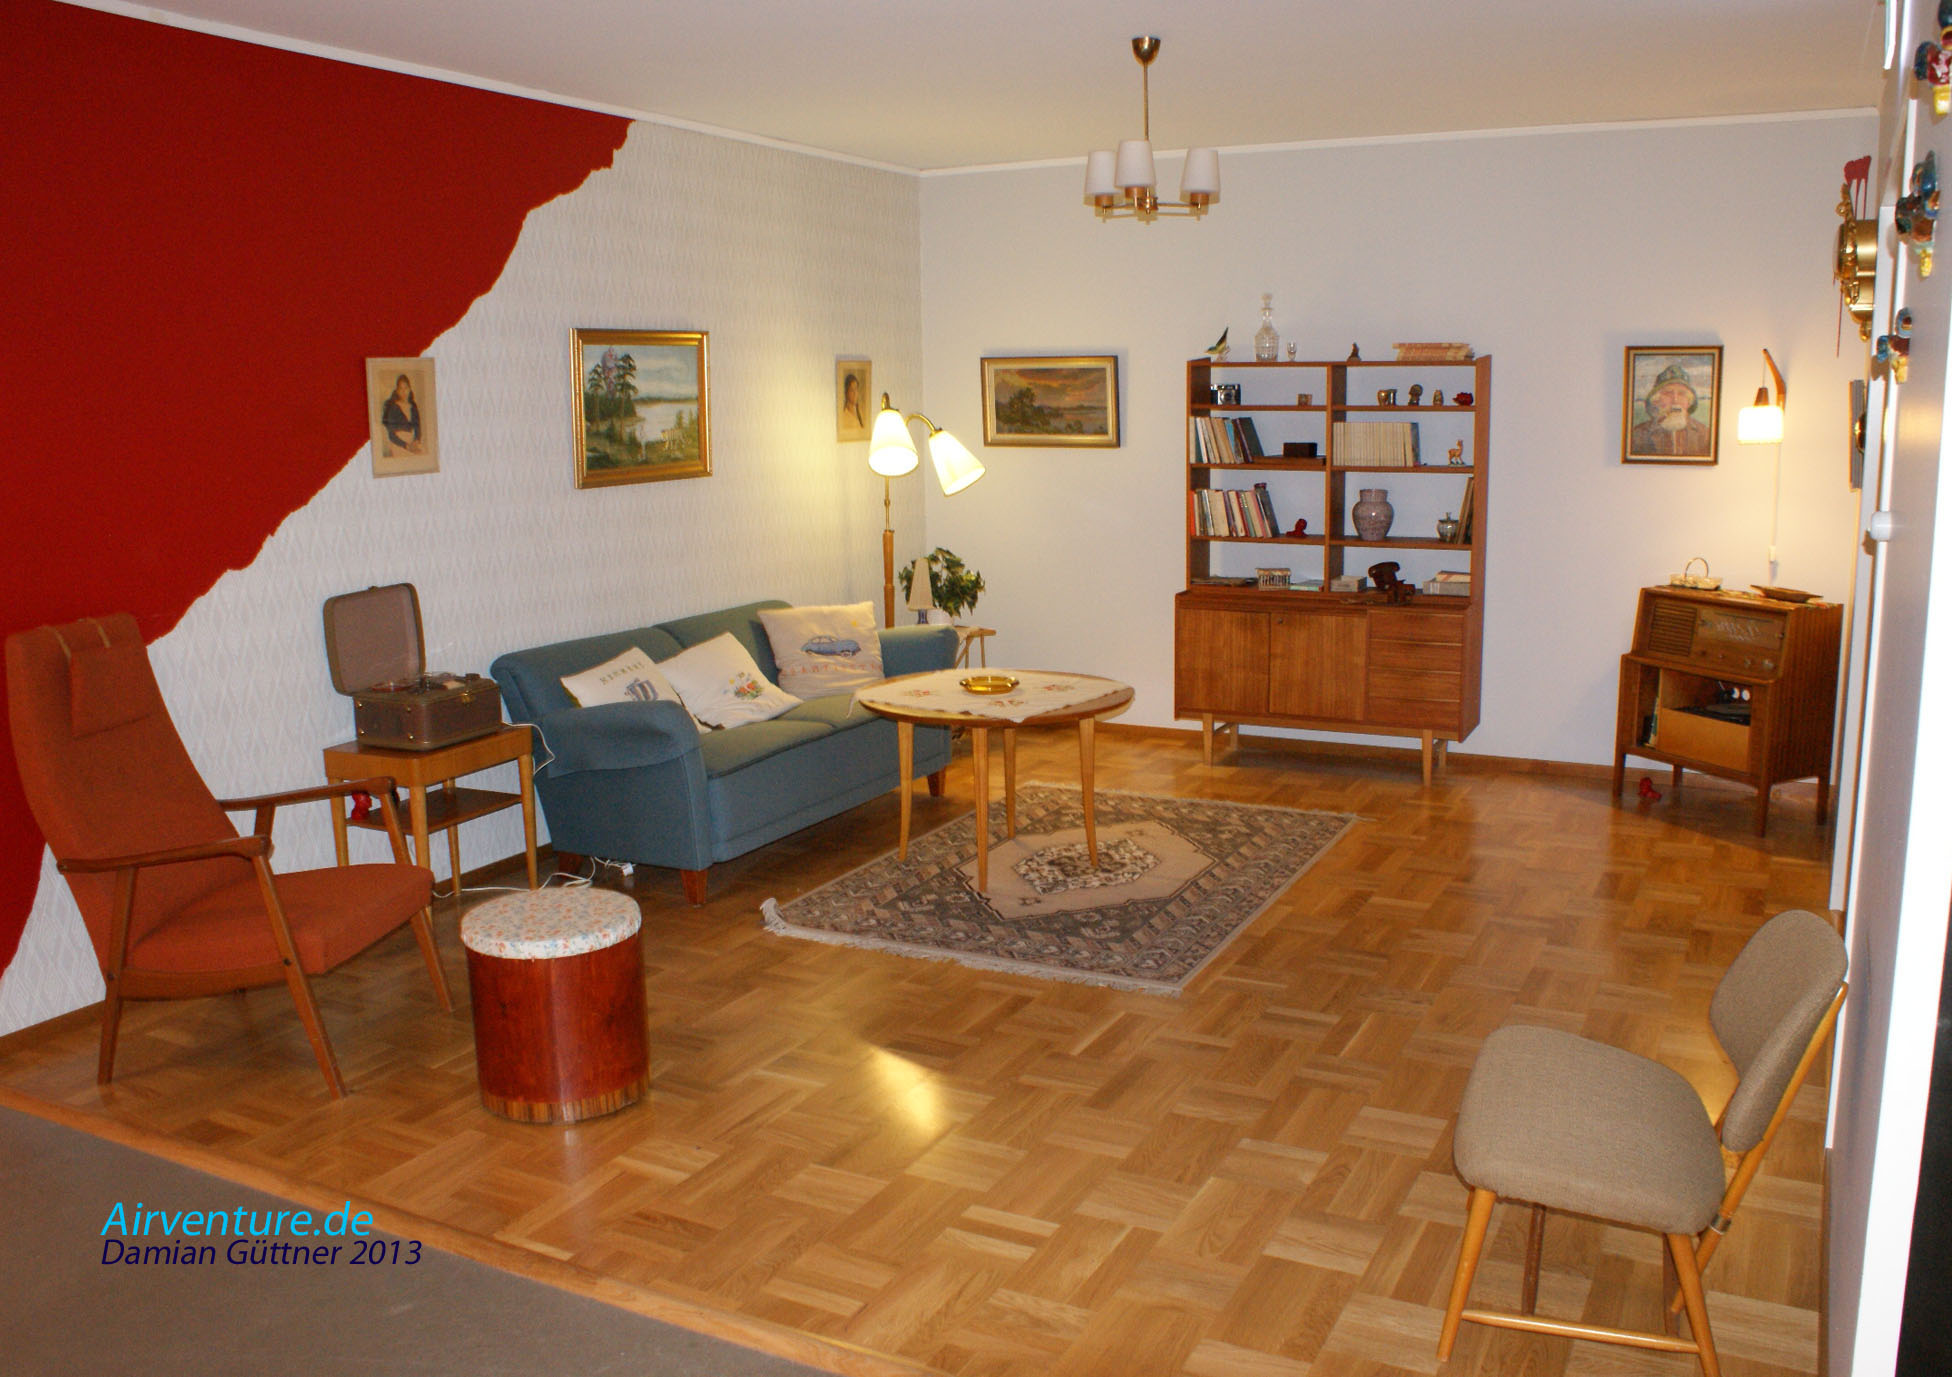 airventure tipp flygvapenmuseum link ping schweden teil 2. Black Bedroom Furniture Sets. Home Design Ideas